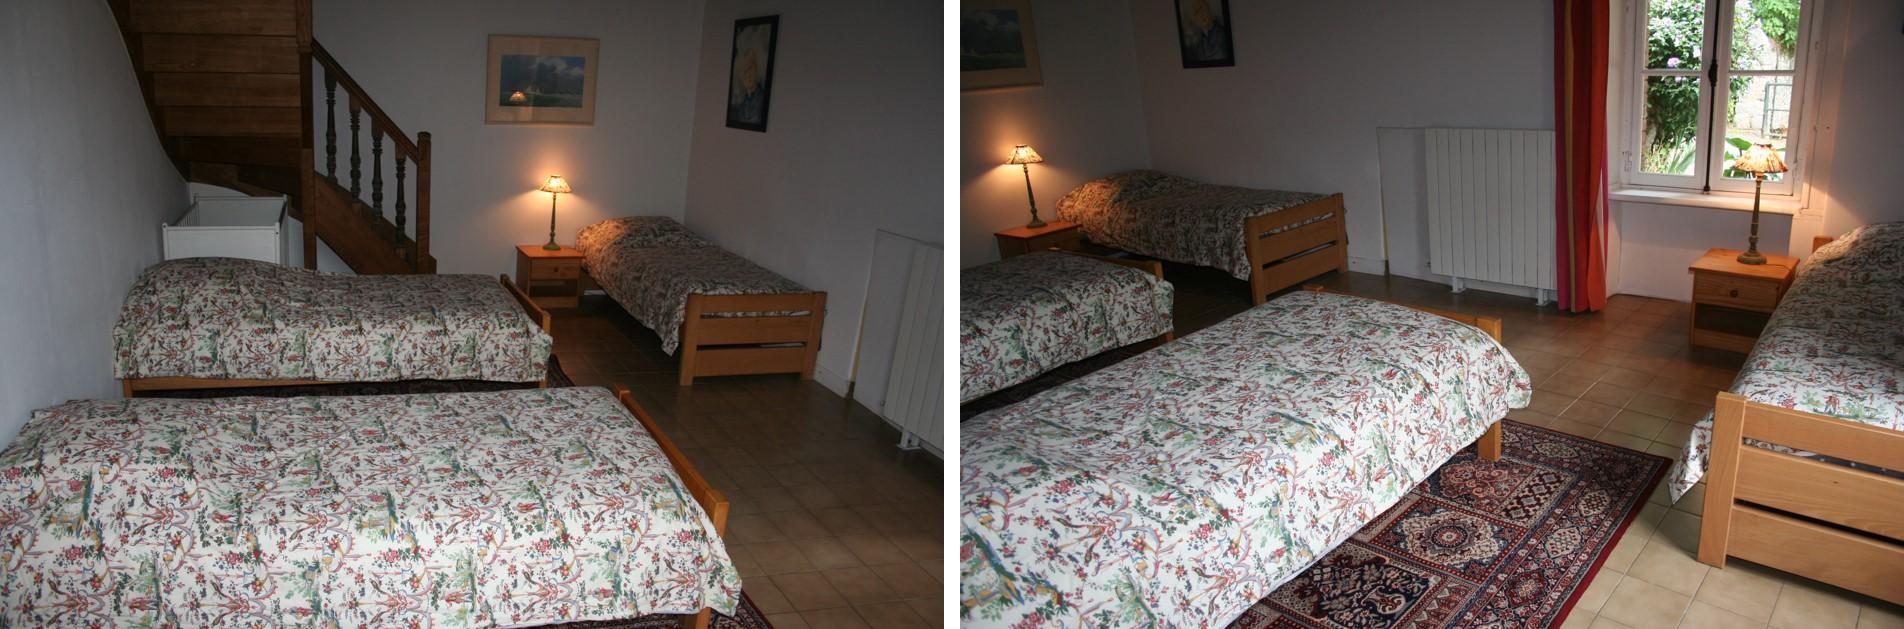 Banniere ferme chambre 4 lits